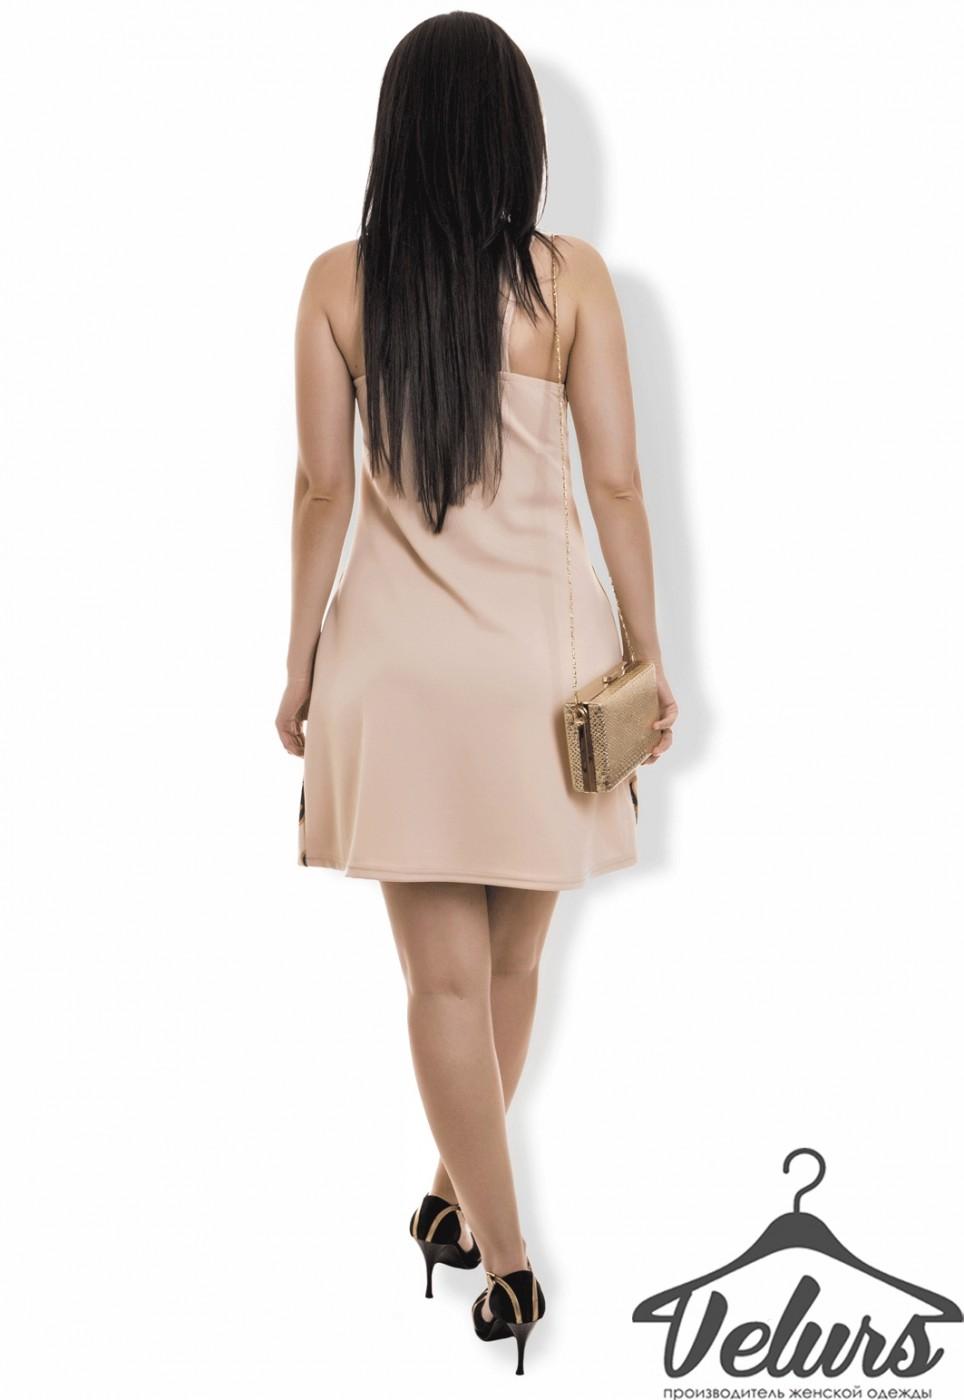 Velurs: Платье 21964 - фото 6